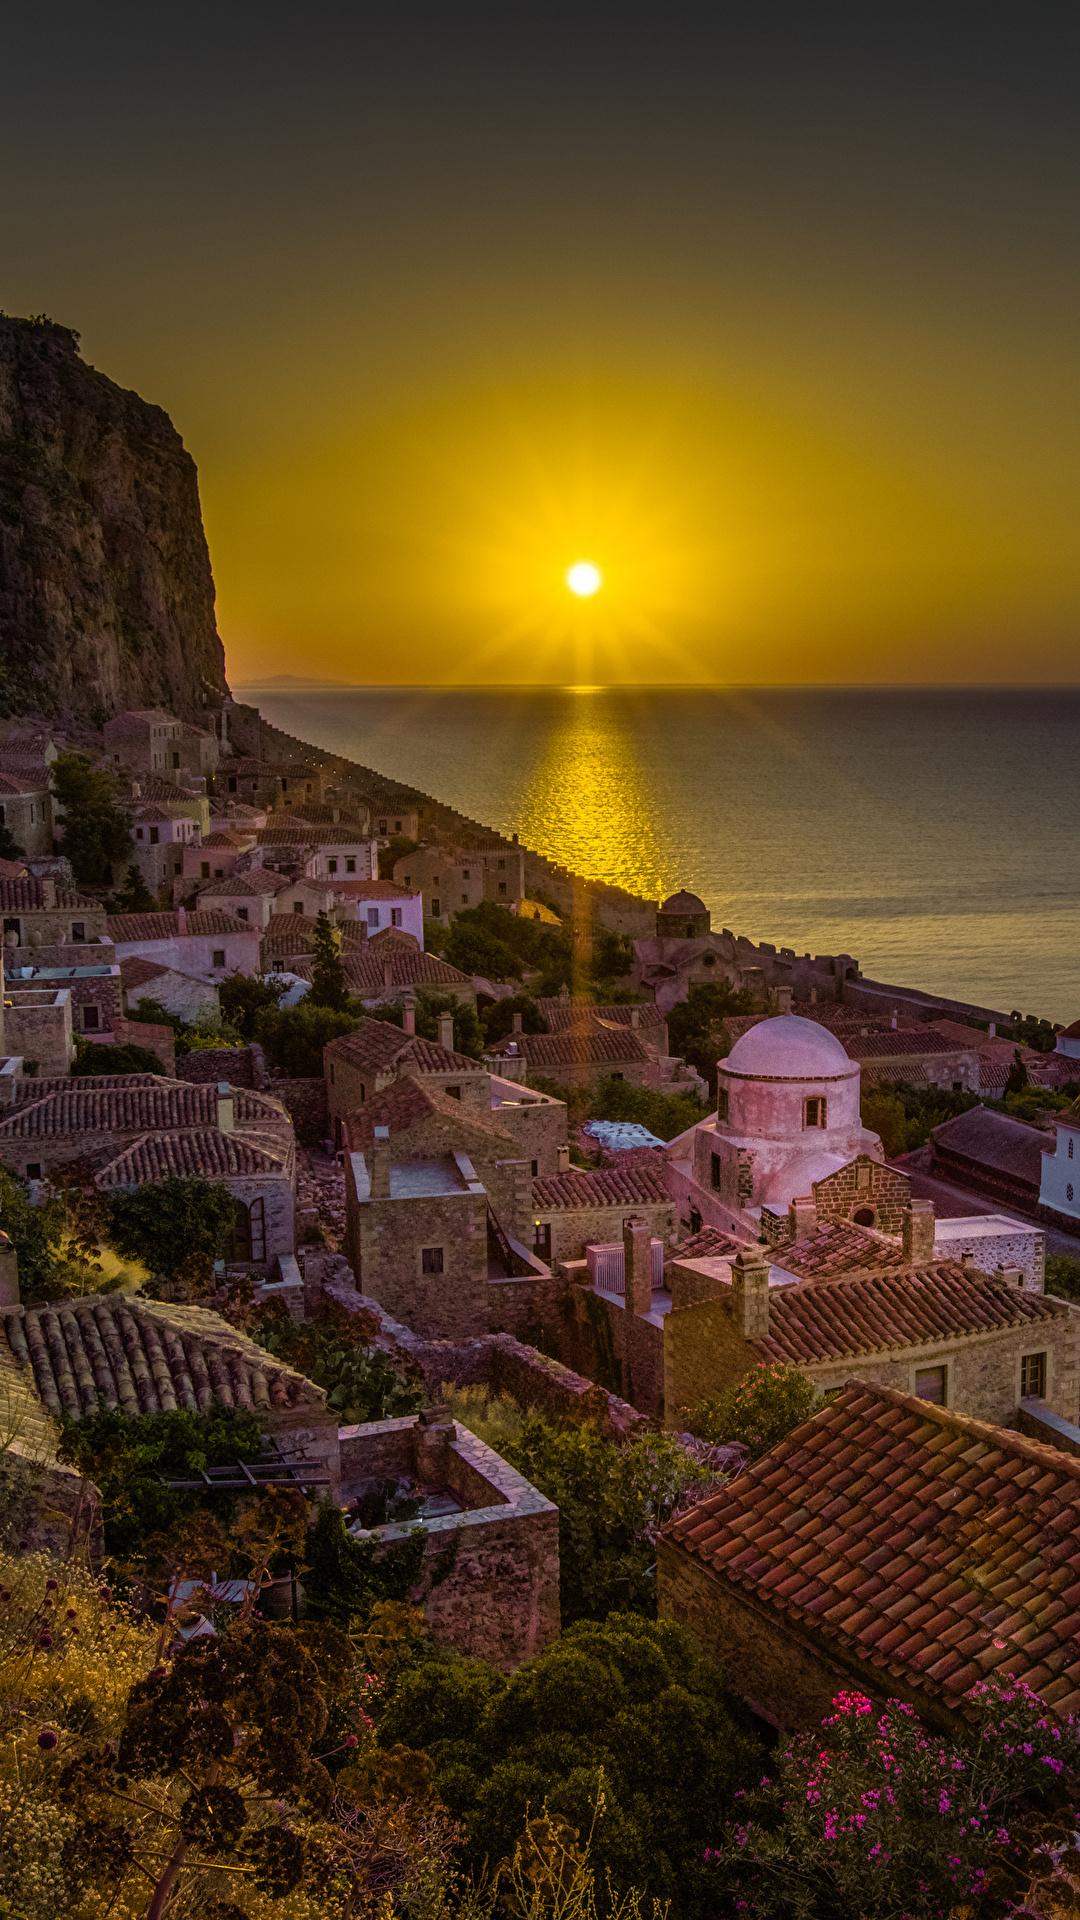 Photos Greece Monemvasia Sun Sea Roof Rock Sunrises and 1080x1920 1080x1920